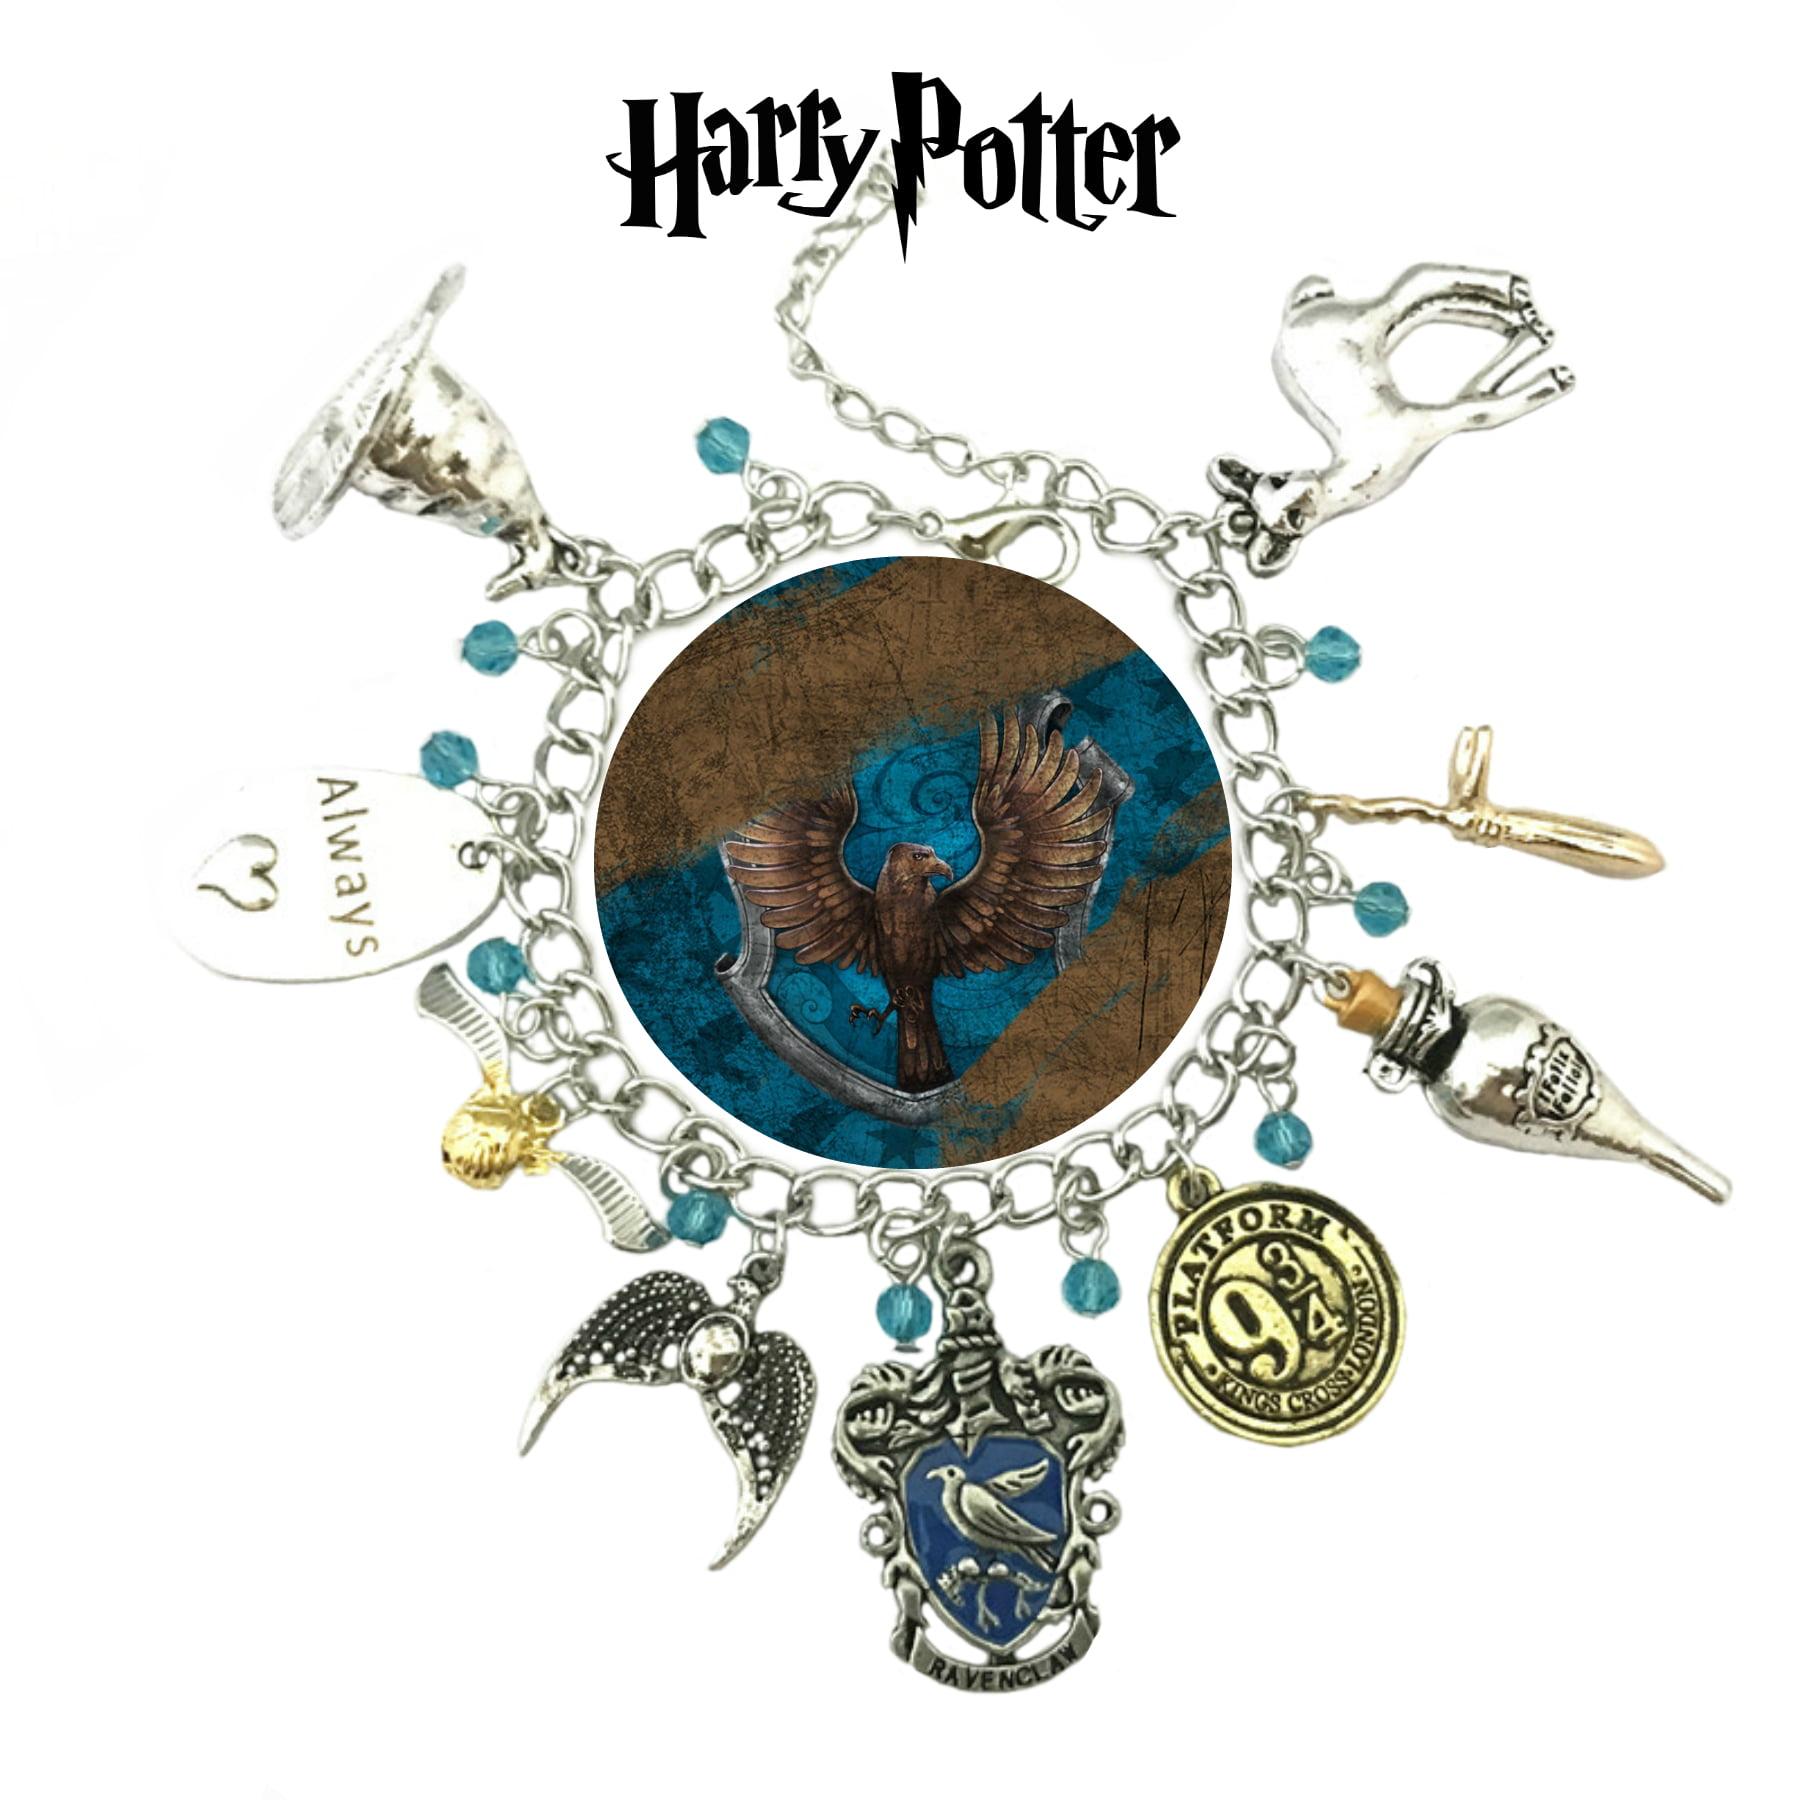 Charm BRACELET Harry Potter Inspired Jewellery Blue Ravenclaw Girls Fan Gift